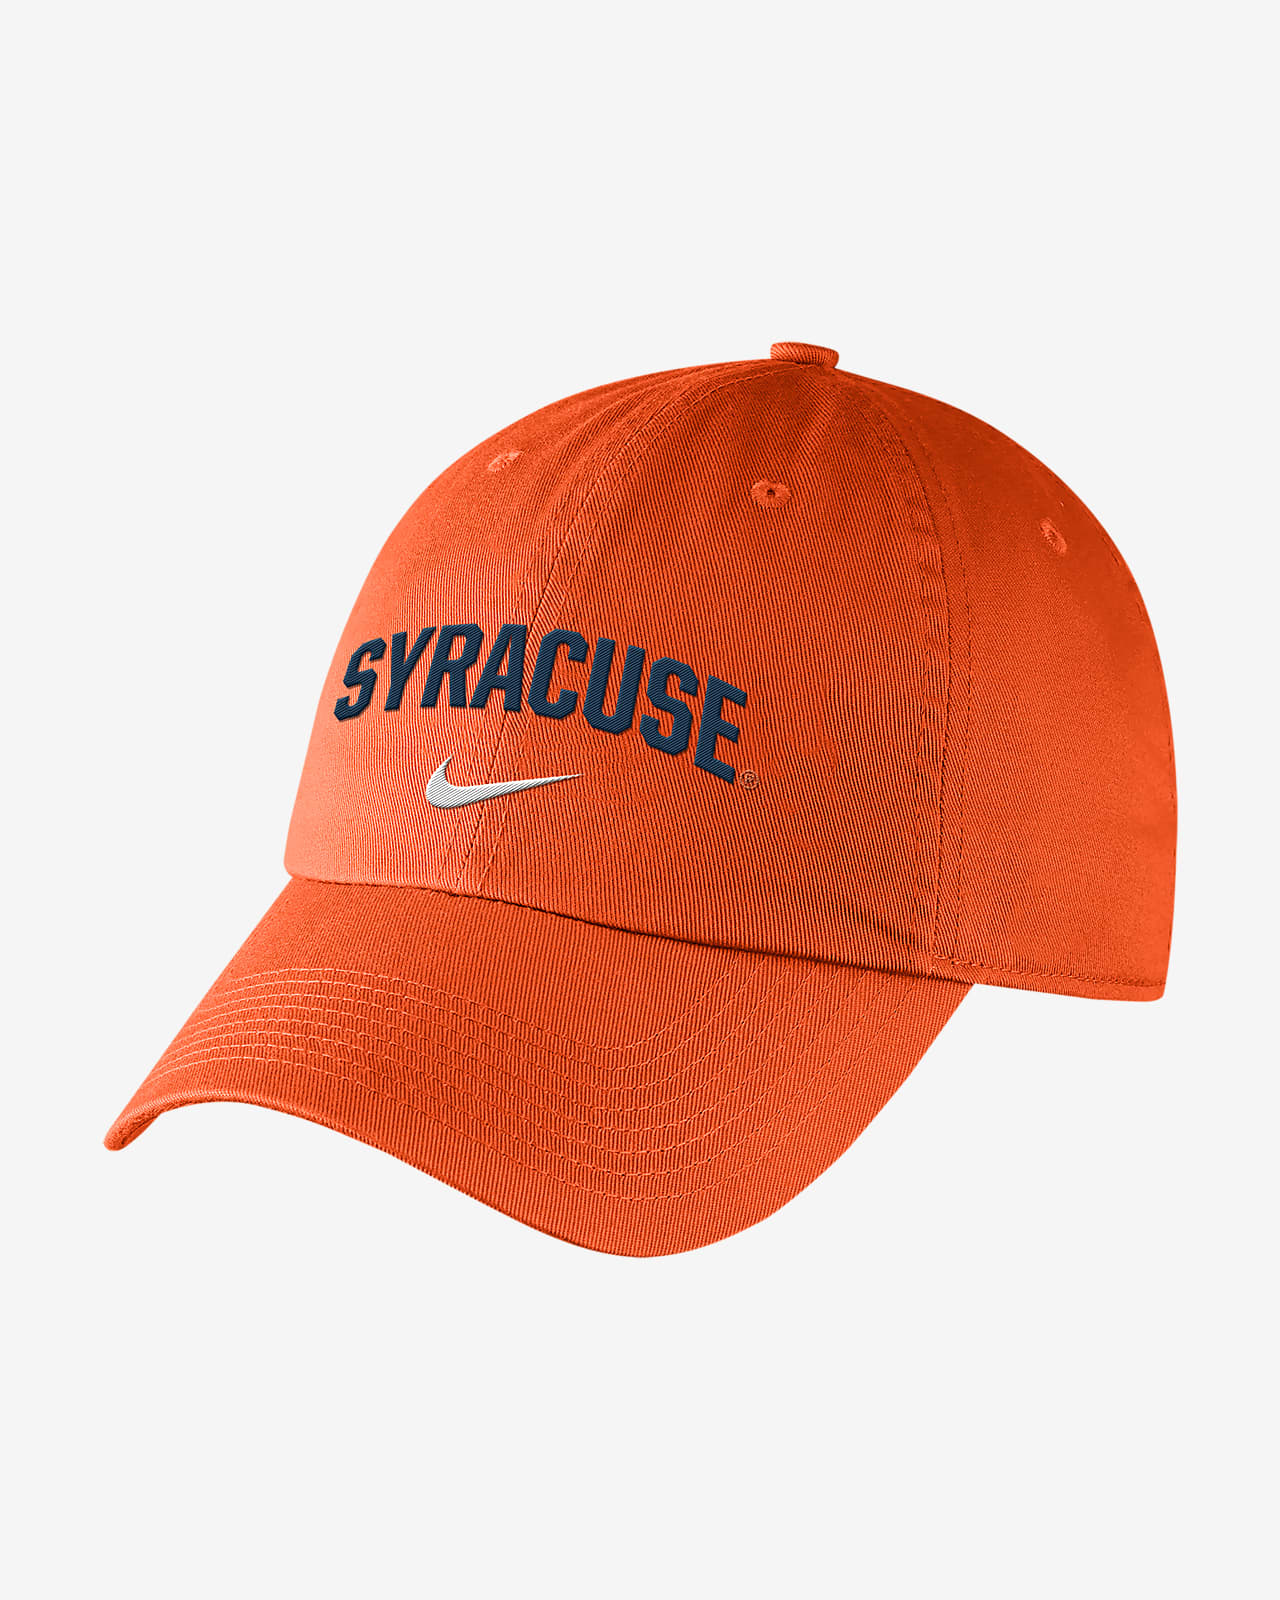 Nike College (Syracuse) Hat